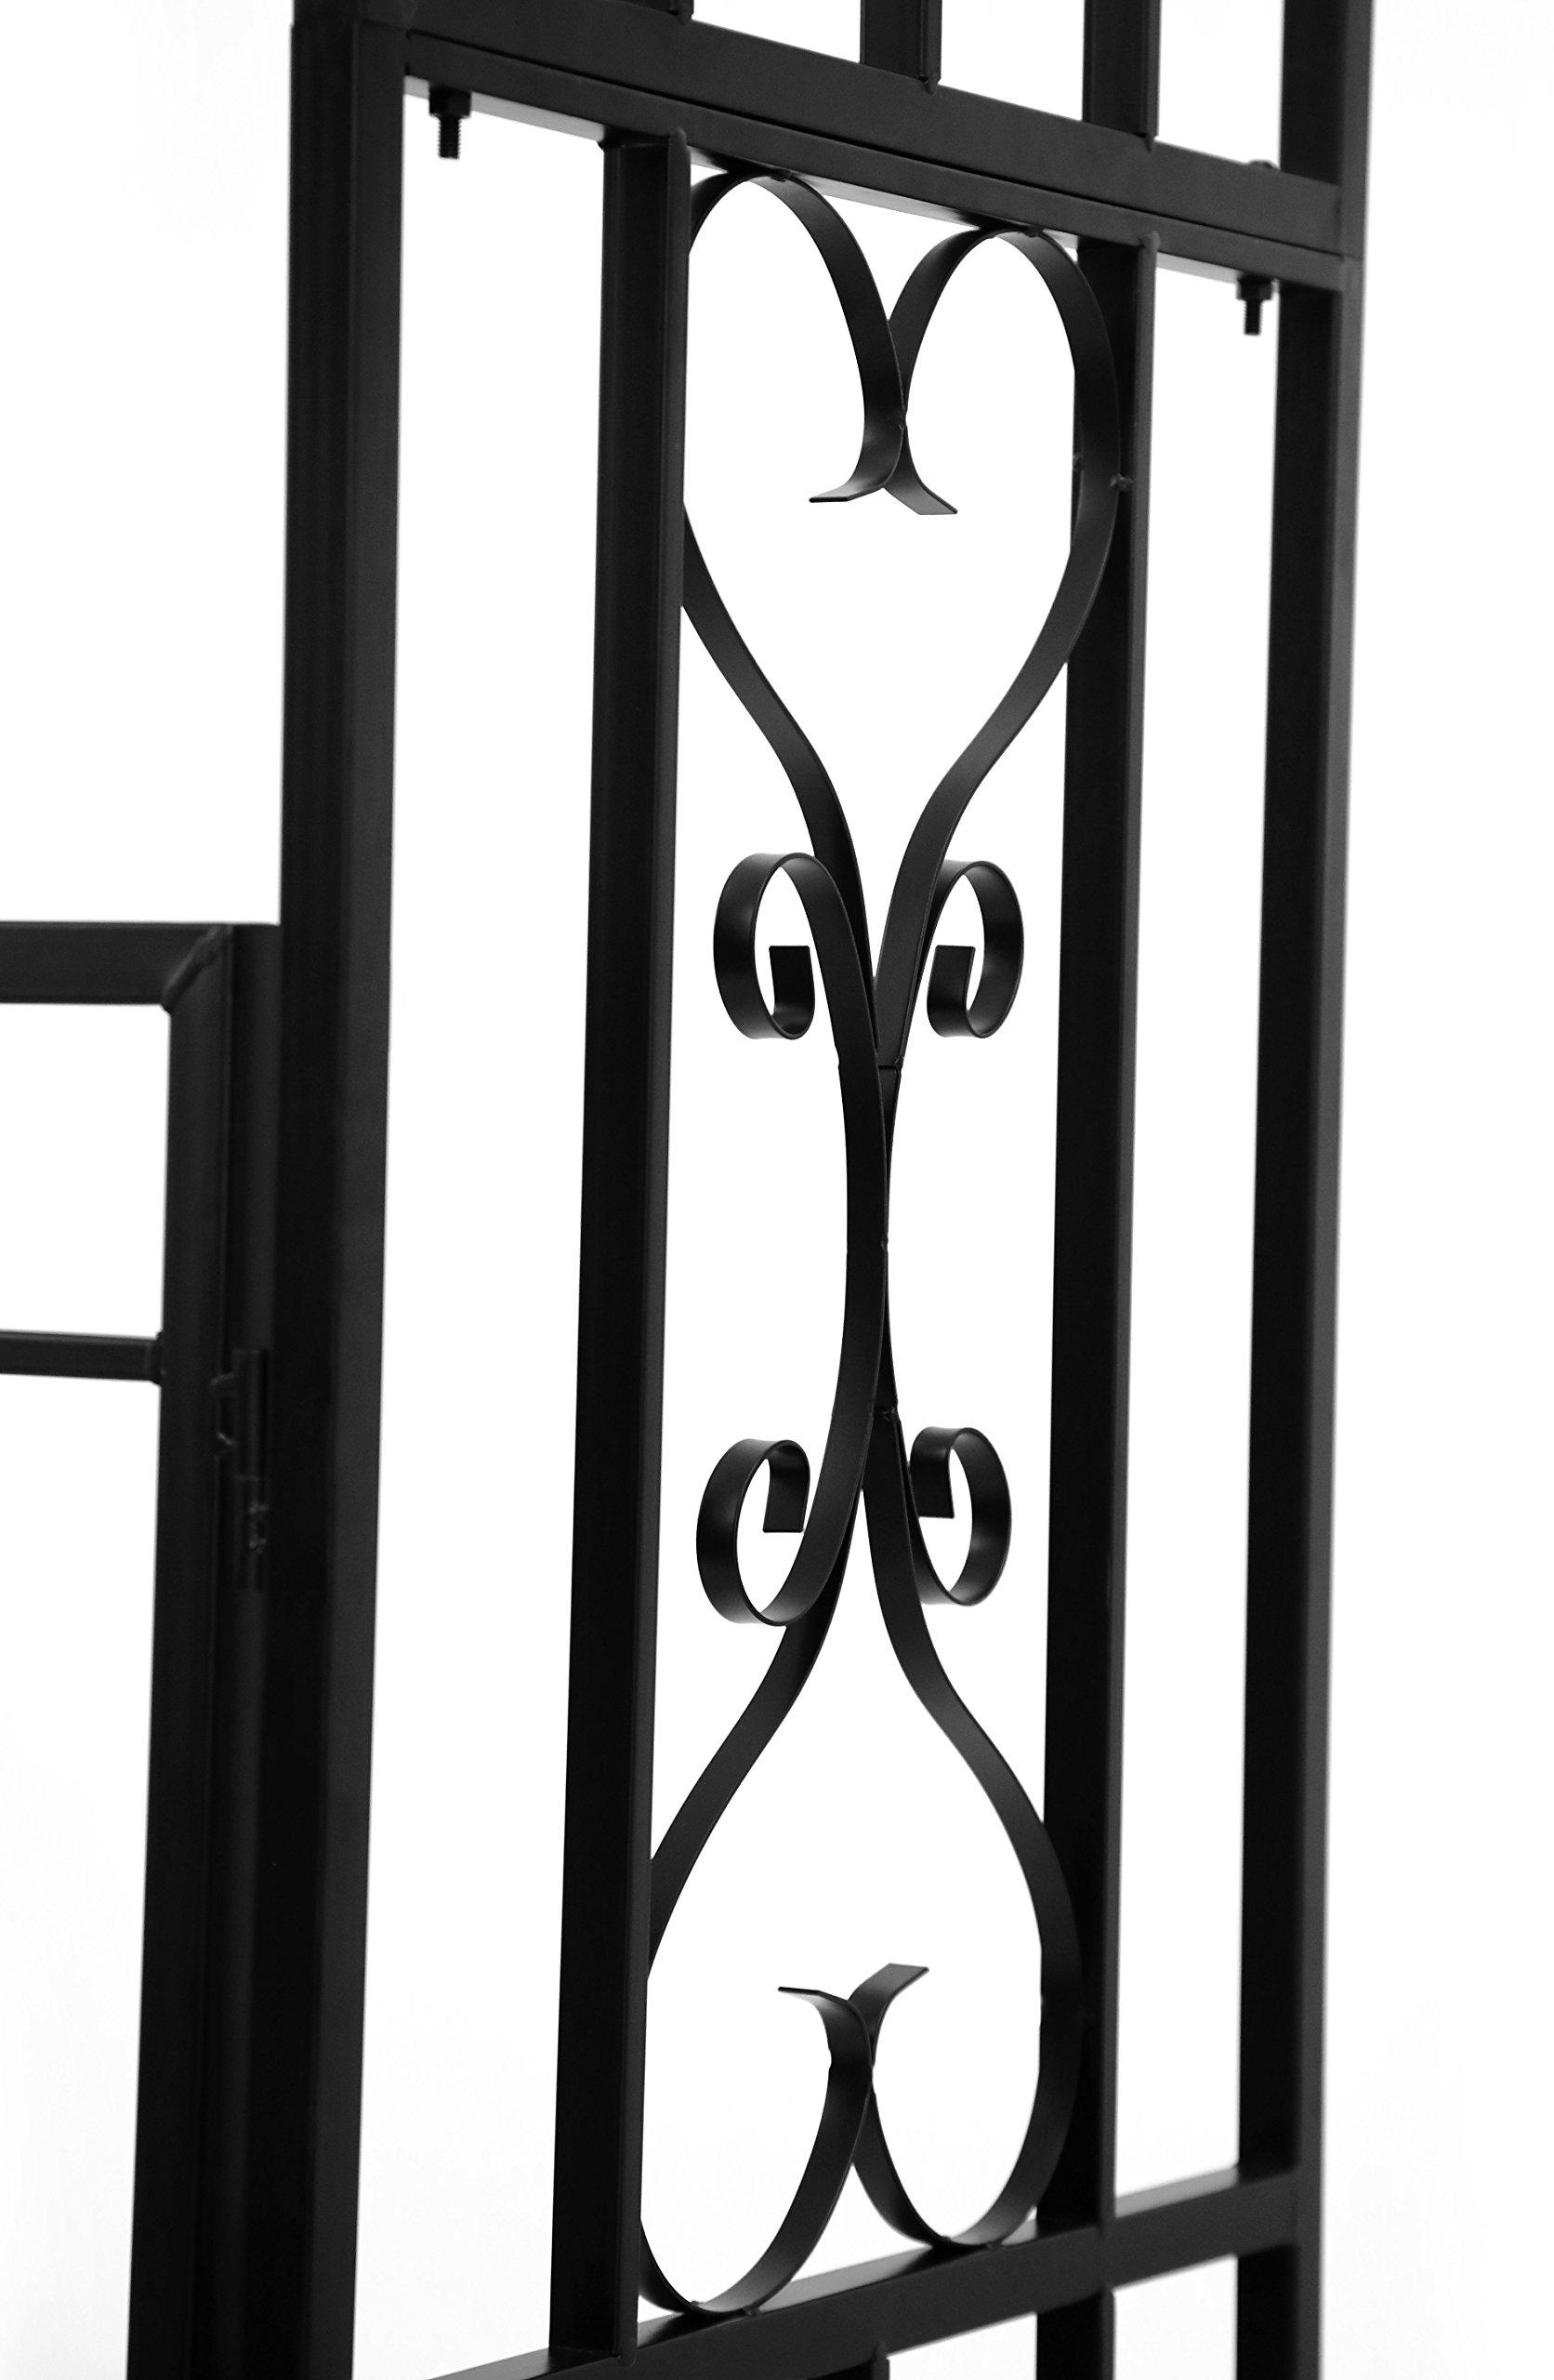 1. GO Steel Garden Arch with Gate, 6'7'' High x 3'7'' Wide, Garden Arbor for Various Climbing Plant, Outdoor Garden Lawn Backyard by 1. GO (Image #9)